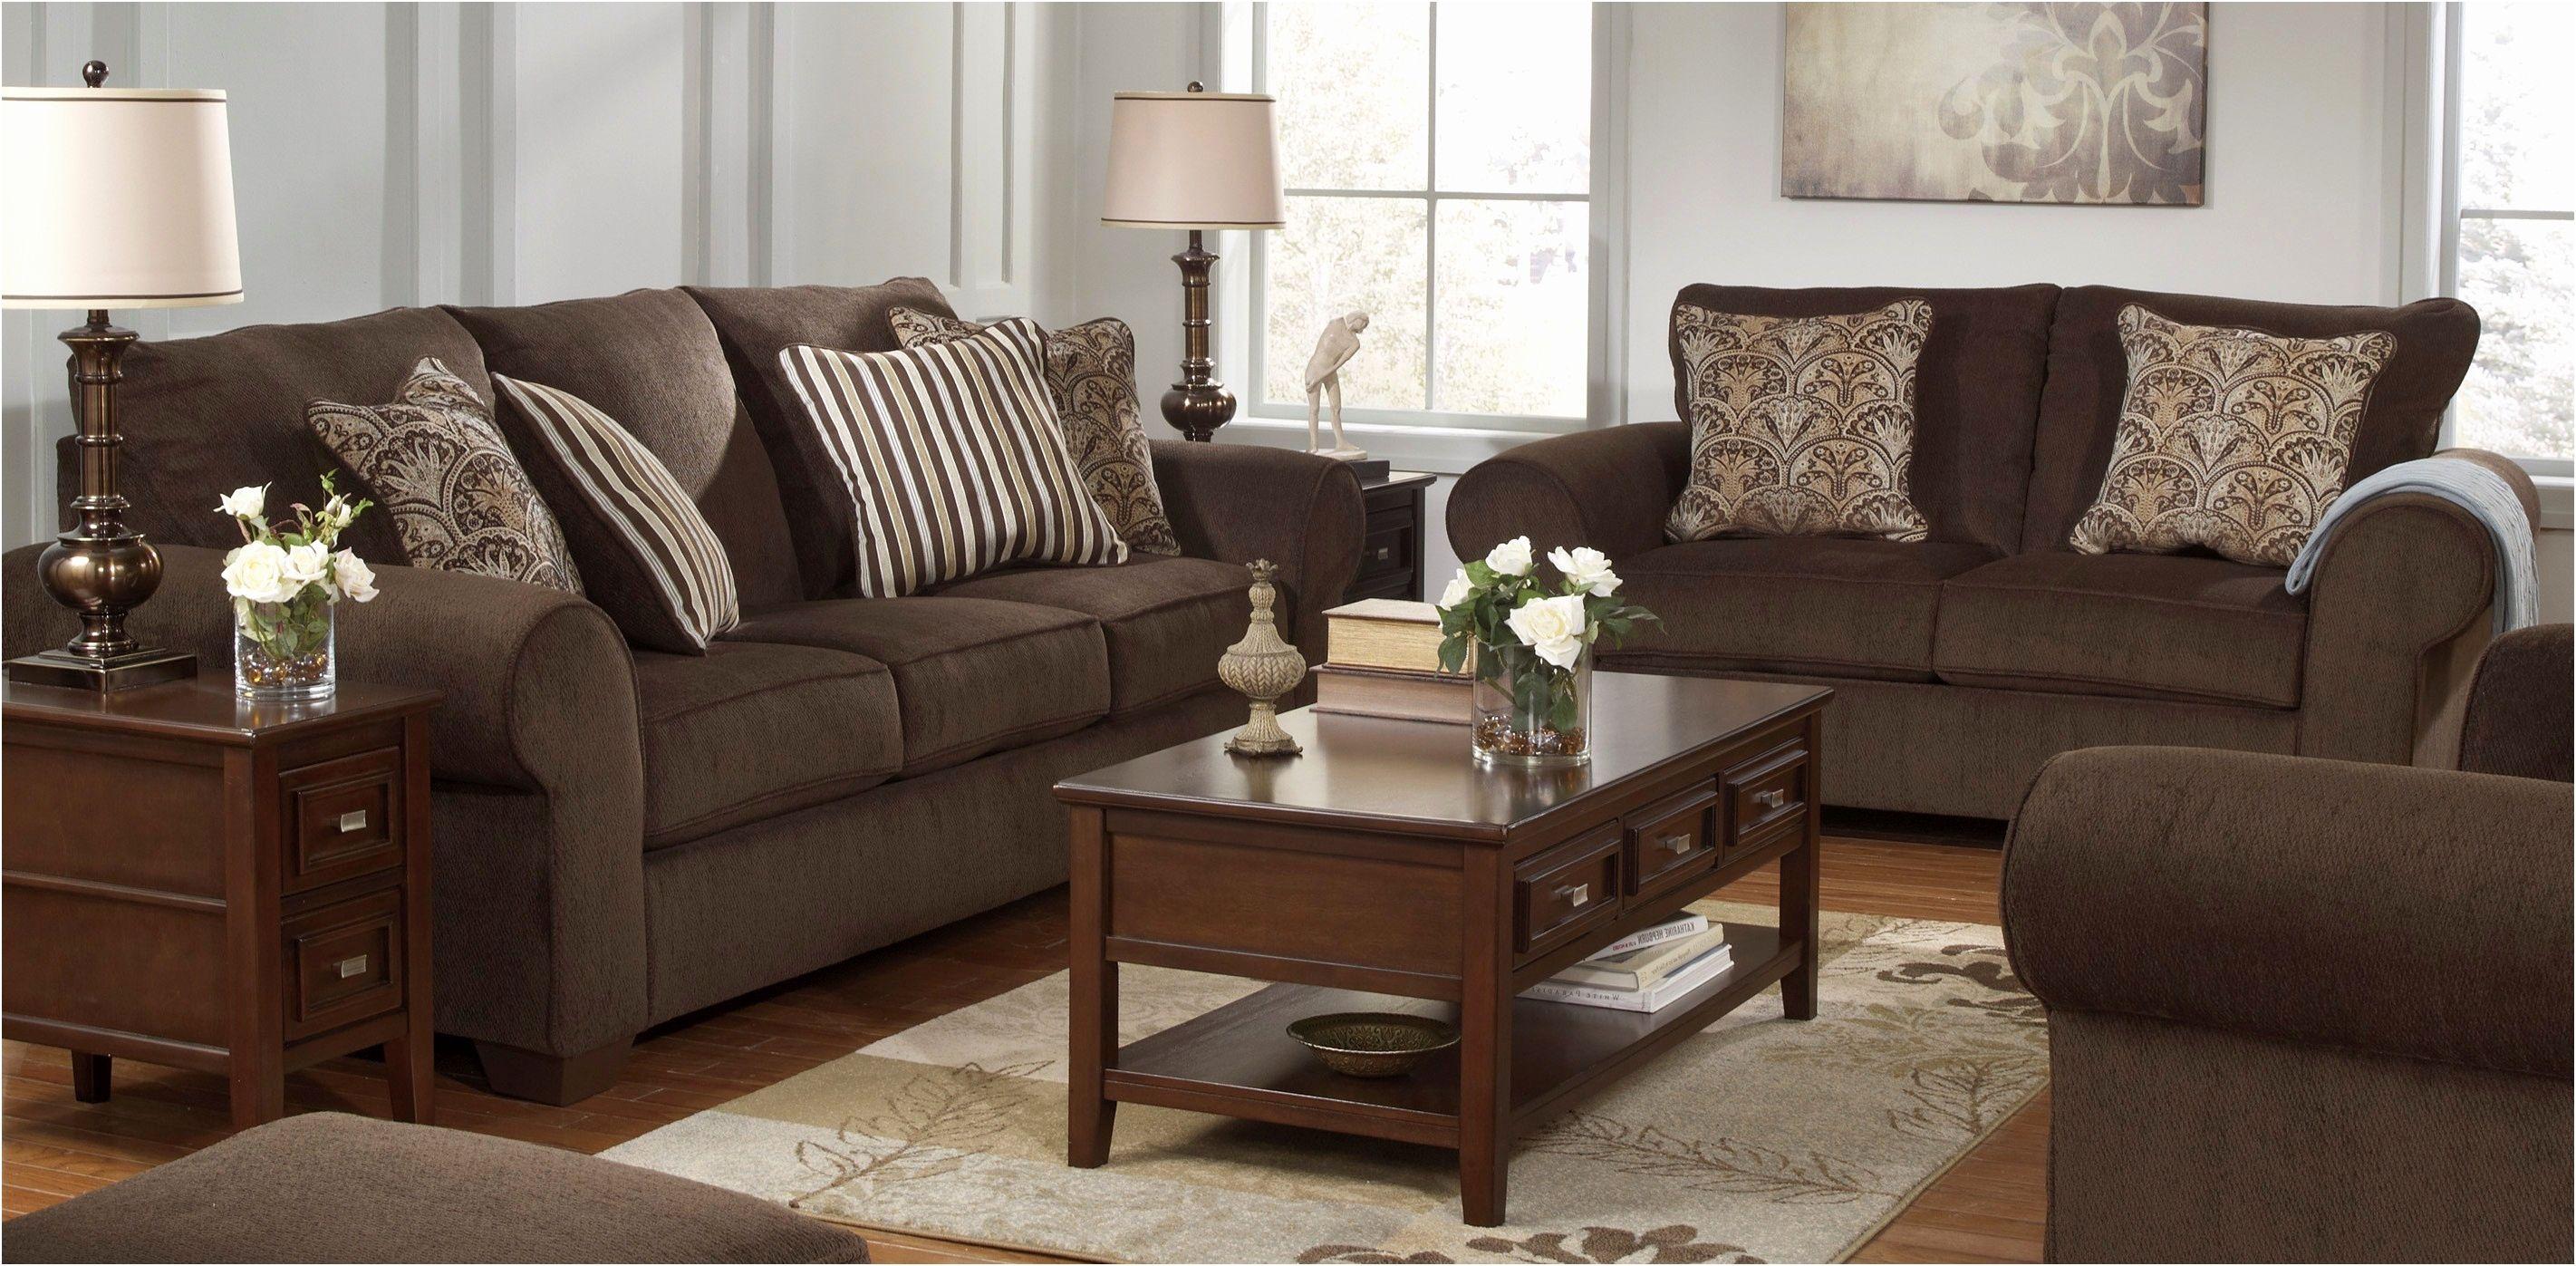 Lovely Sofa Sets Under 500